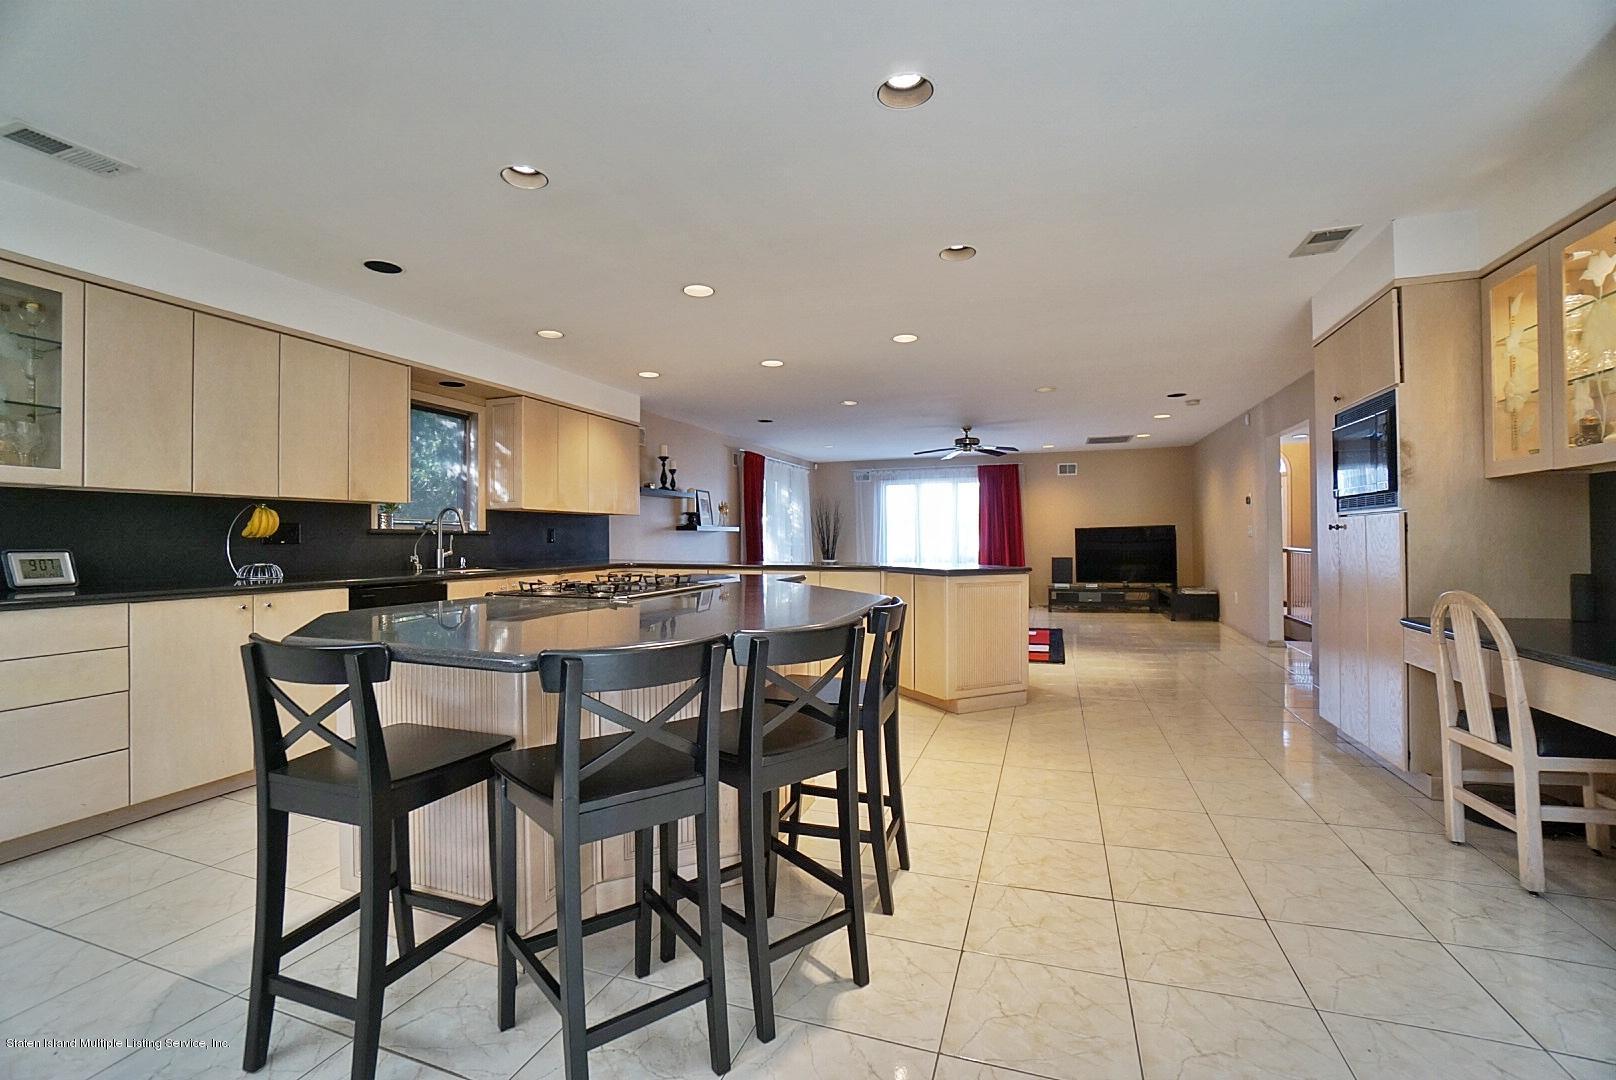 Single Family - Detached 183 Kensington Avenue  Staten Island, NY 10305, MLS-1127107-9